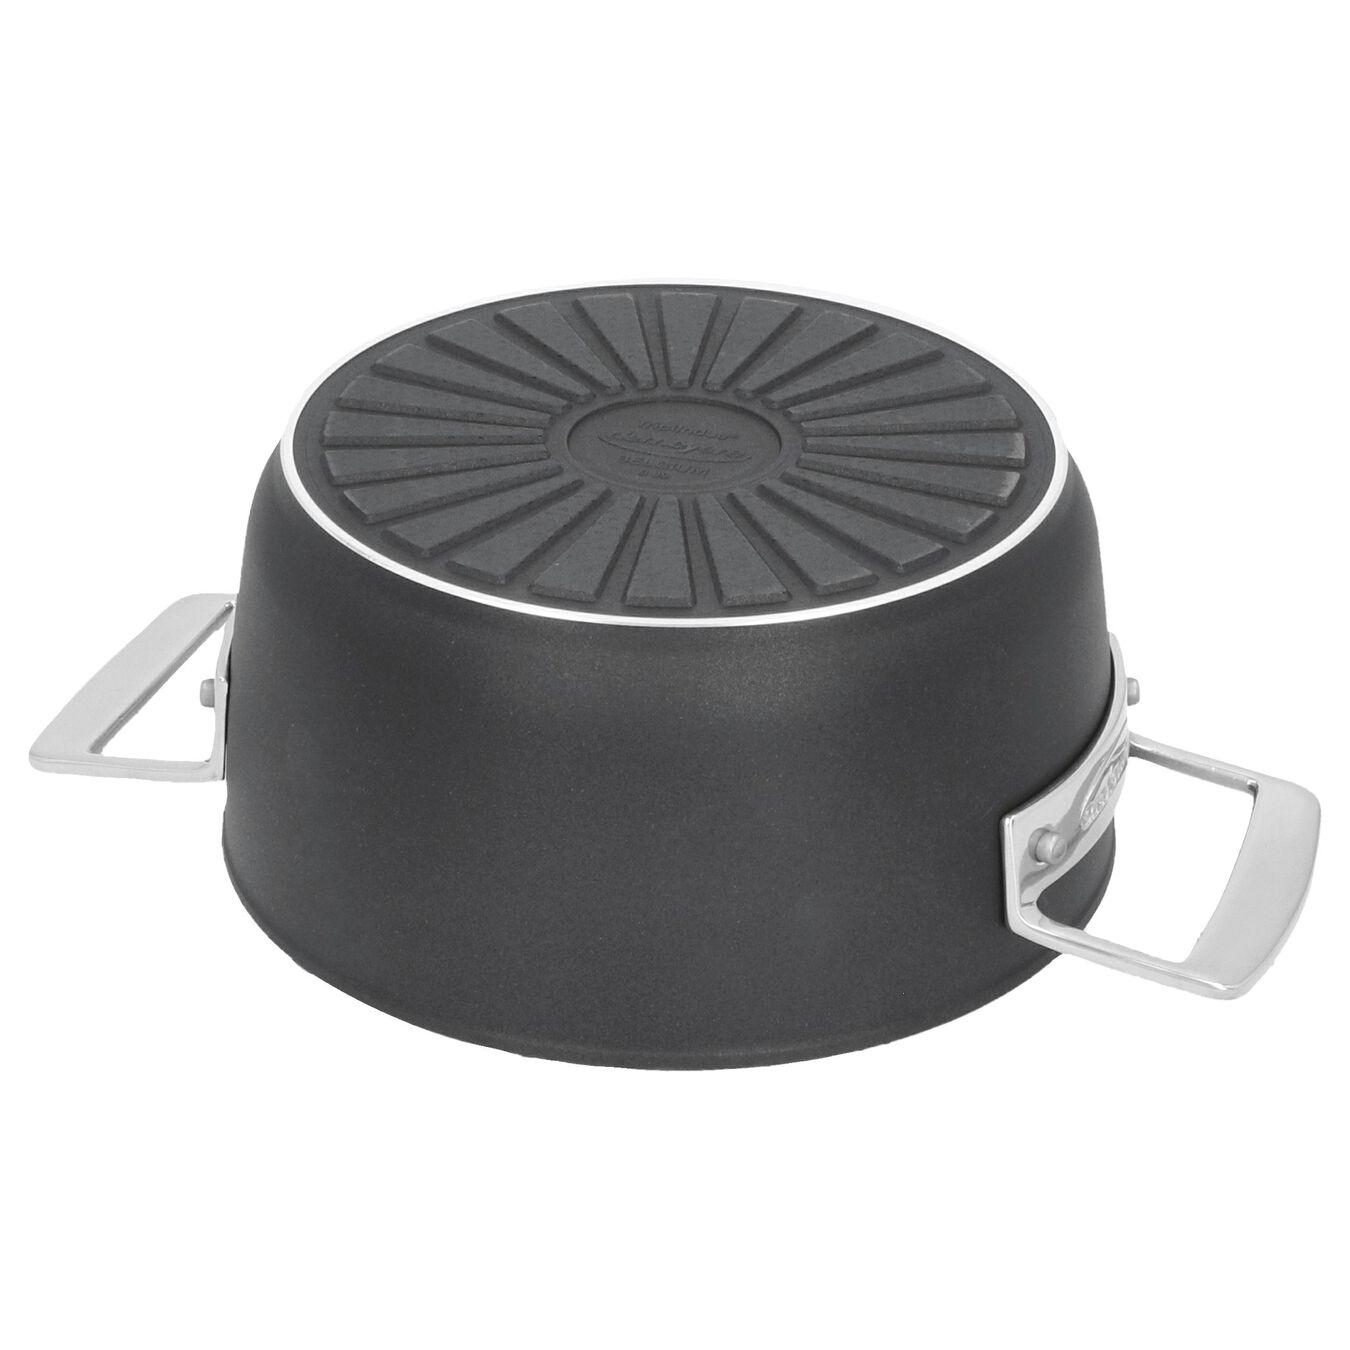 Kookpot met deksel Duraslide Titanium 18 cm / 2 l,,large 2